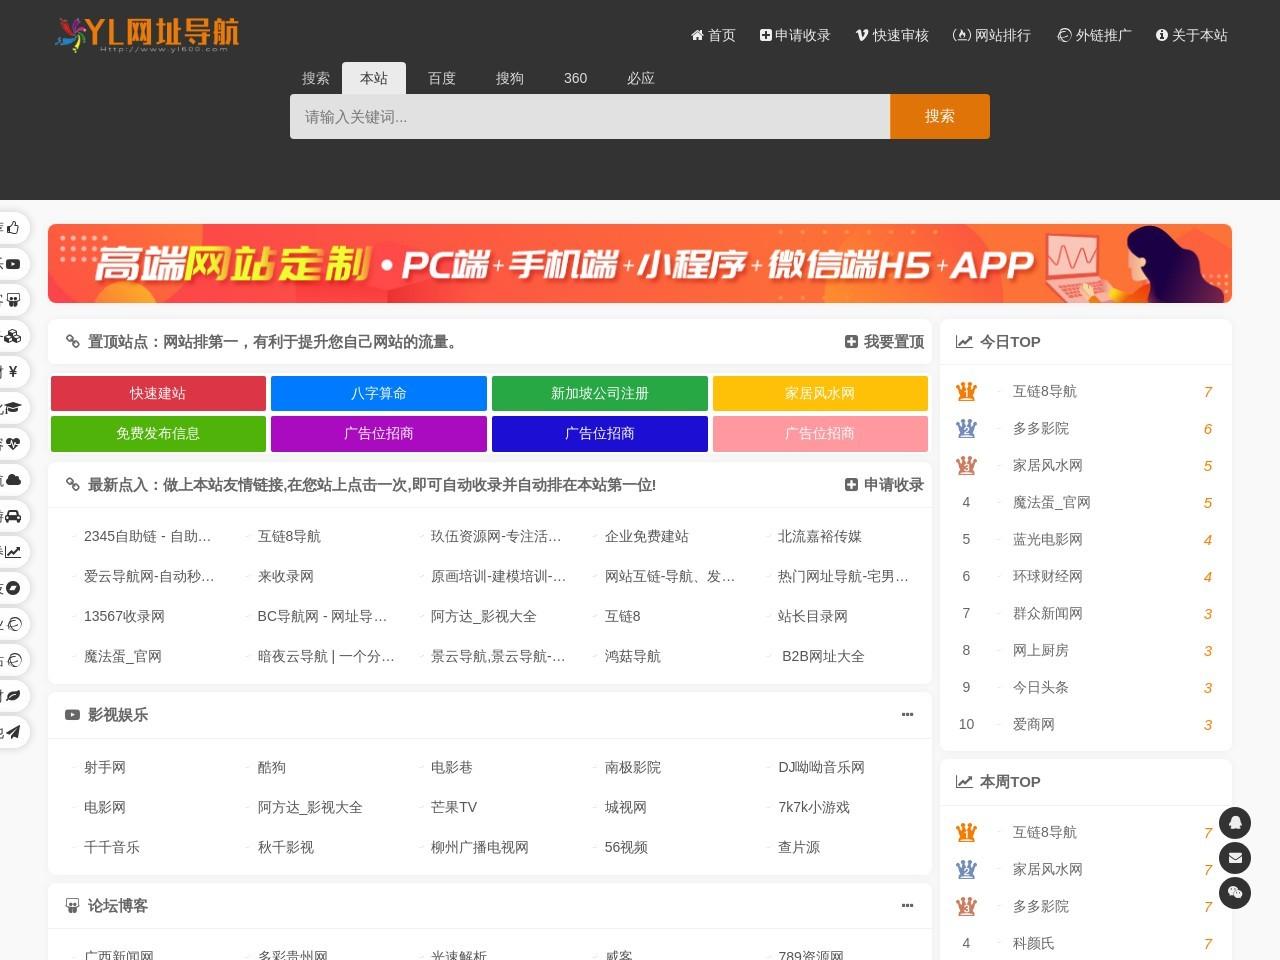 YL分类目录网